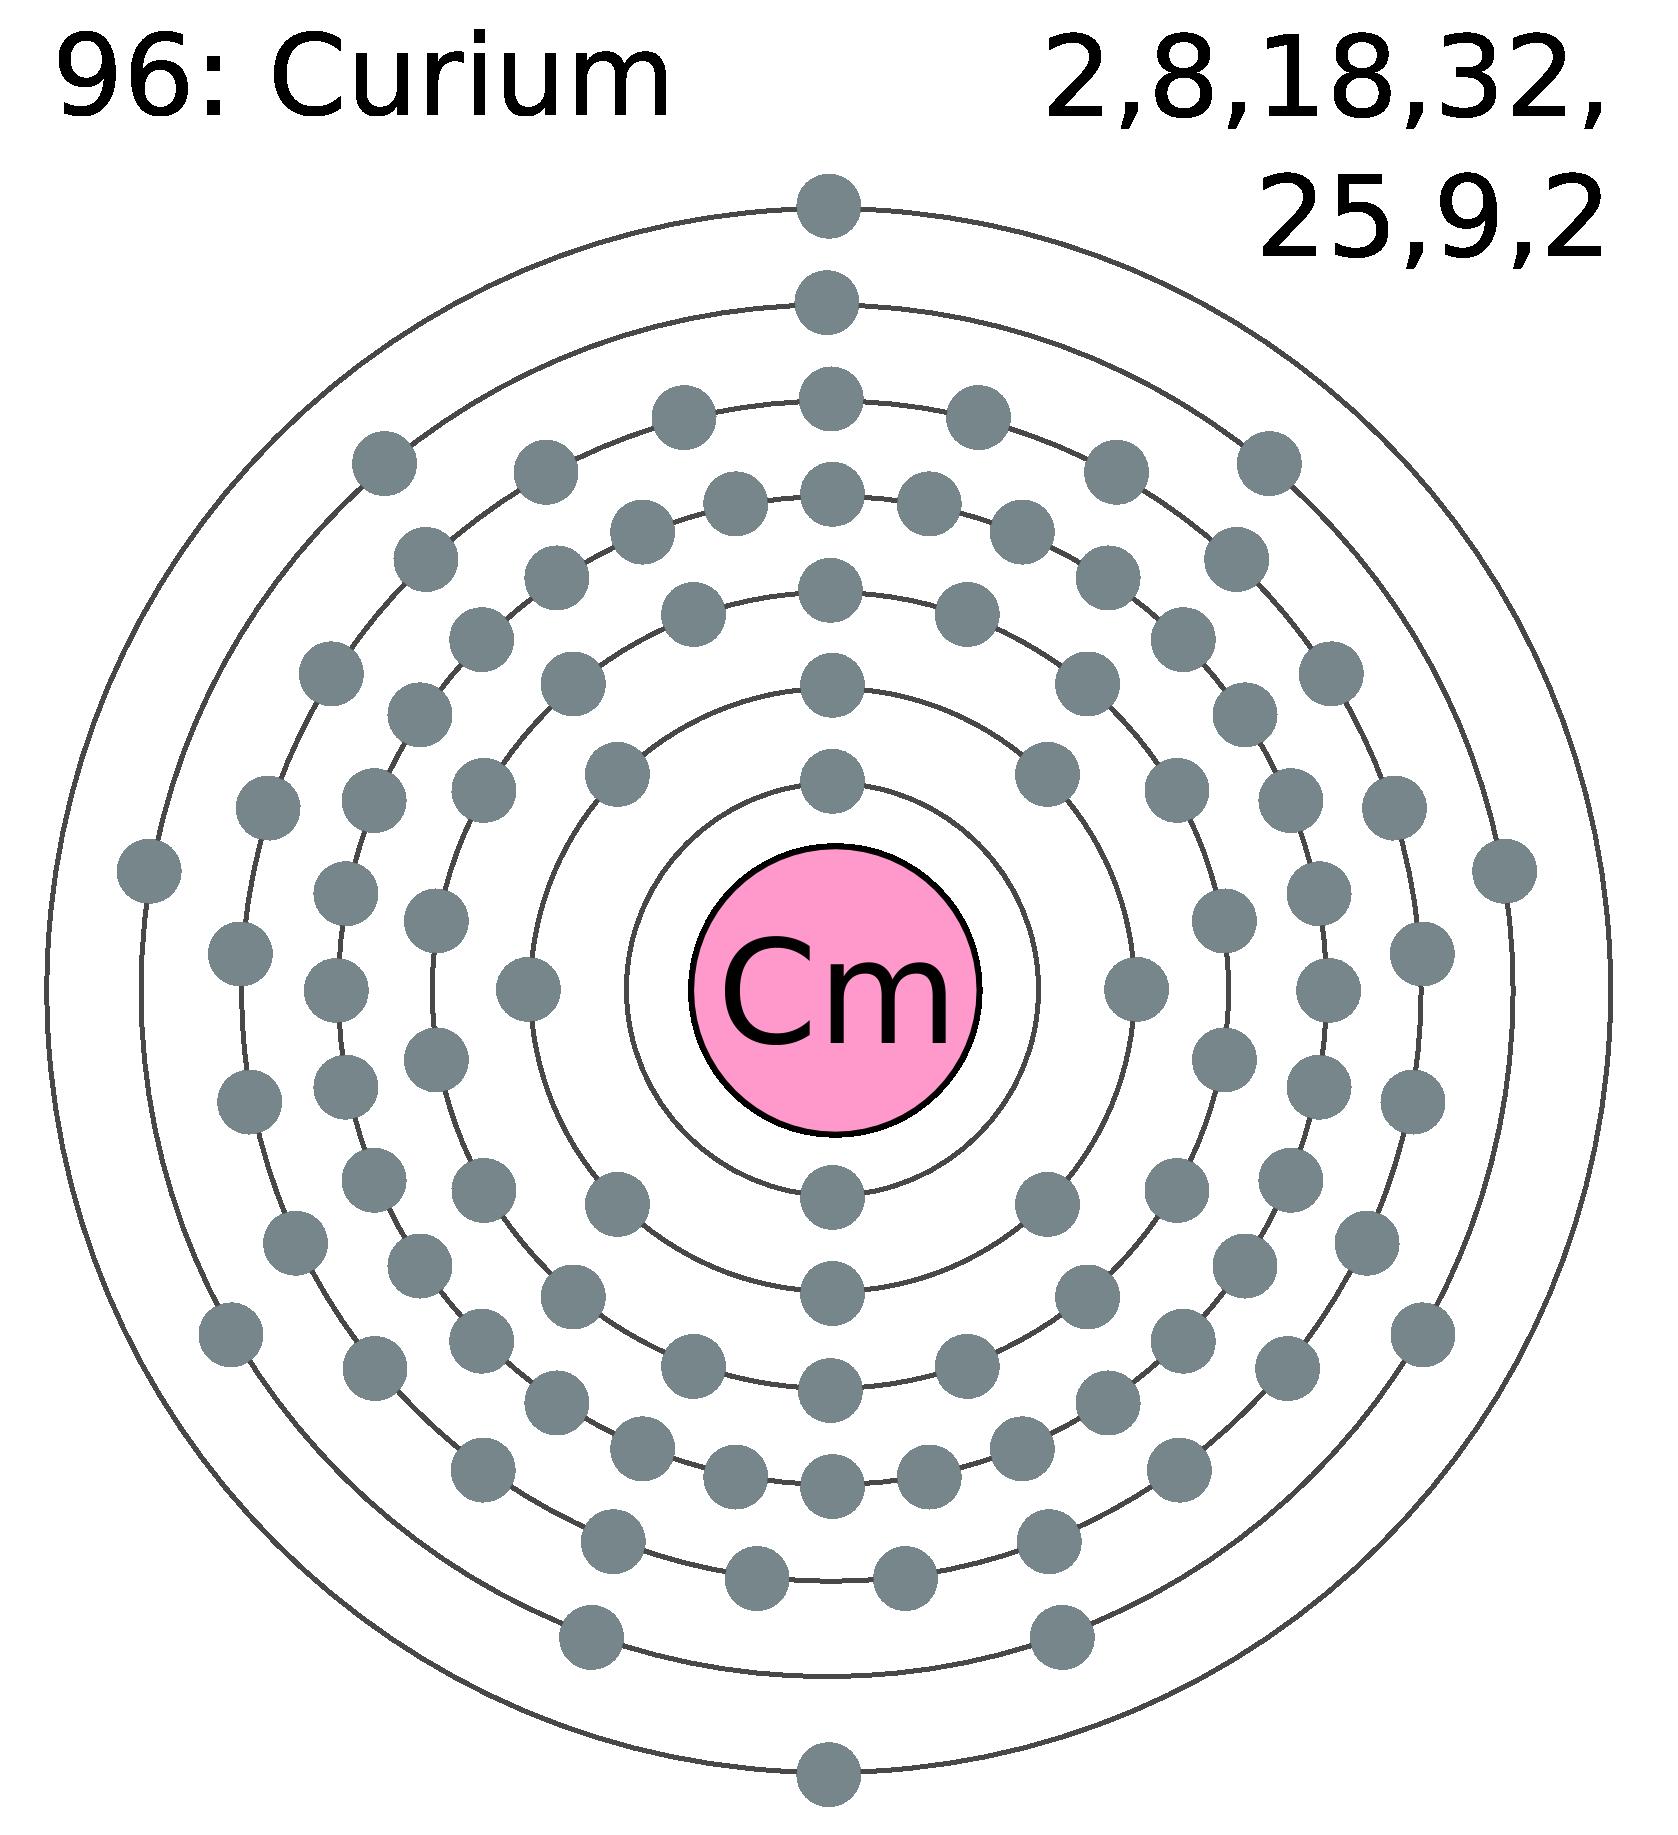 medium resolution of man made element curium possible rough draft idea for tattoo